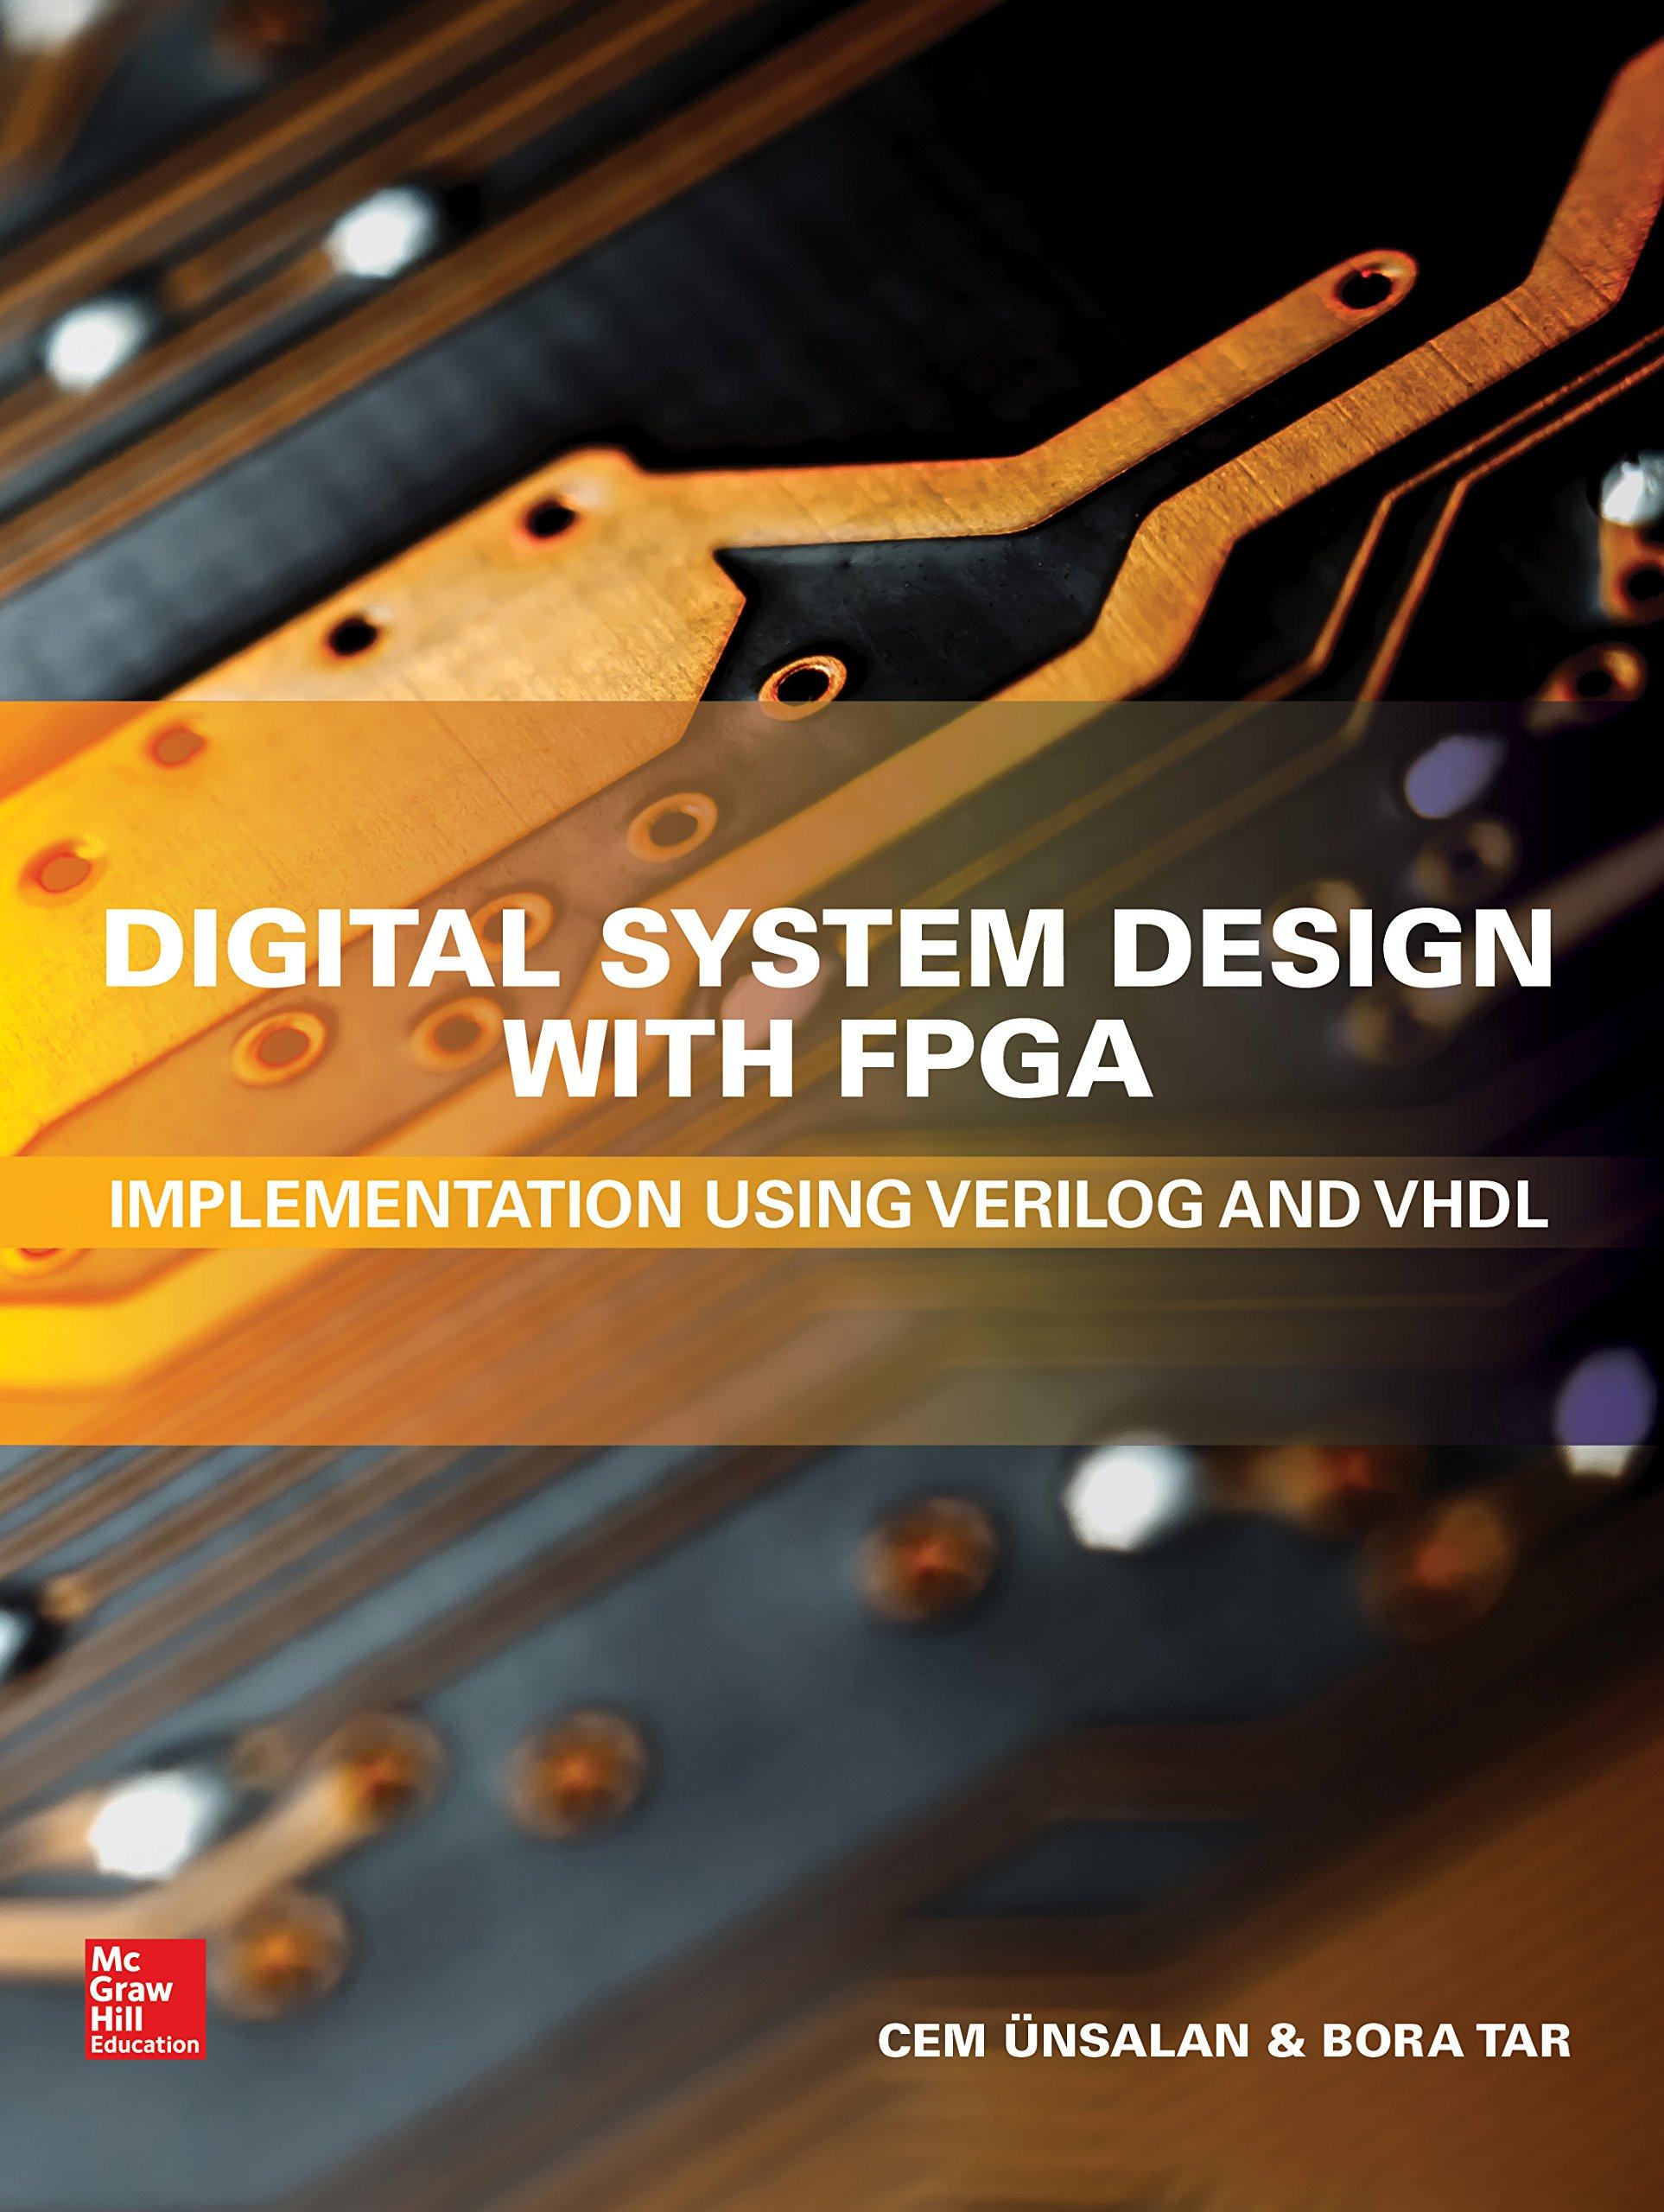 Digital System Design With Fpga Implementation Using Verilog And Vhdl Unsalan Cem Tar Bora Ebook Amazon Com